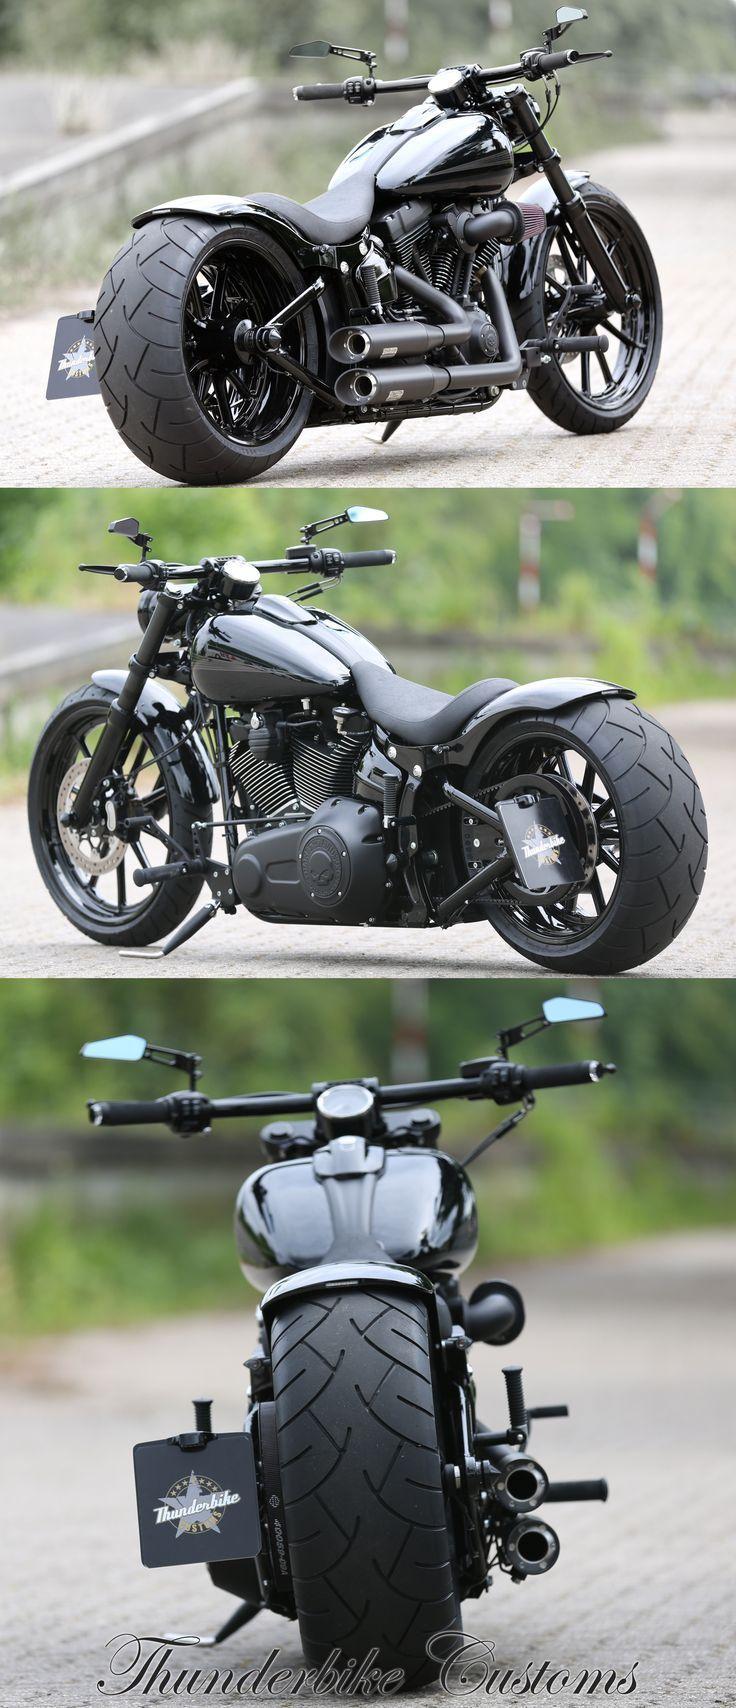 40 Best Motos Images On Pinterest Custom Motorcycles Cars And Wheels Boss Hoss Trike Wiring Diagram Customized Harley Davidson Softail Breakout By Thunderbike Customs Germany Harleydavidsonsporster